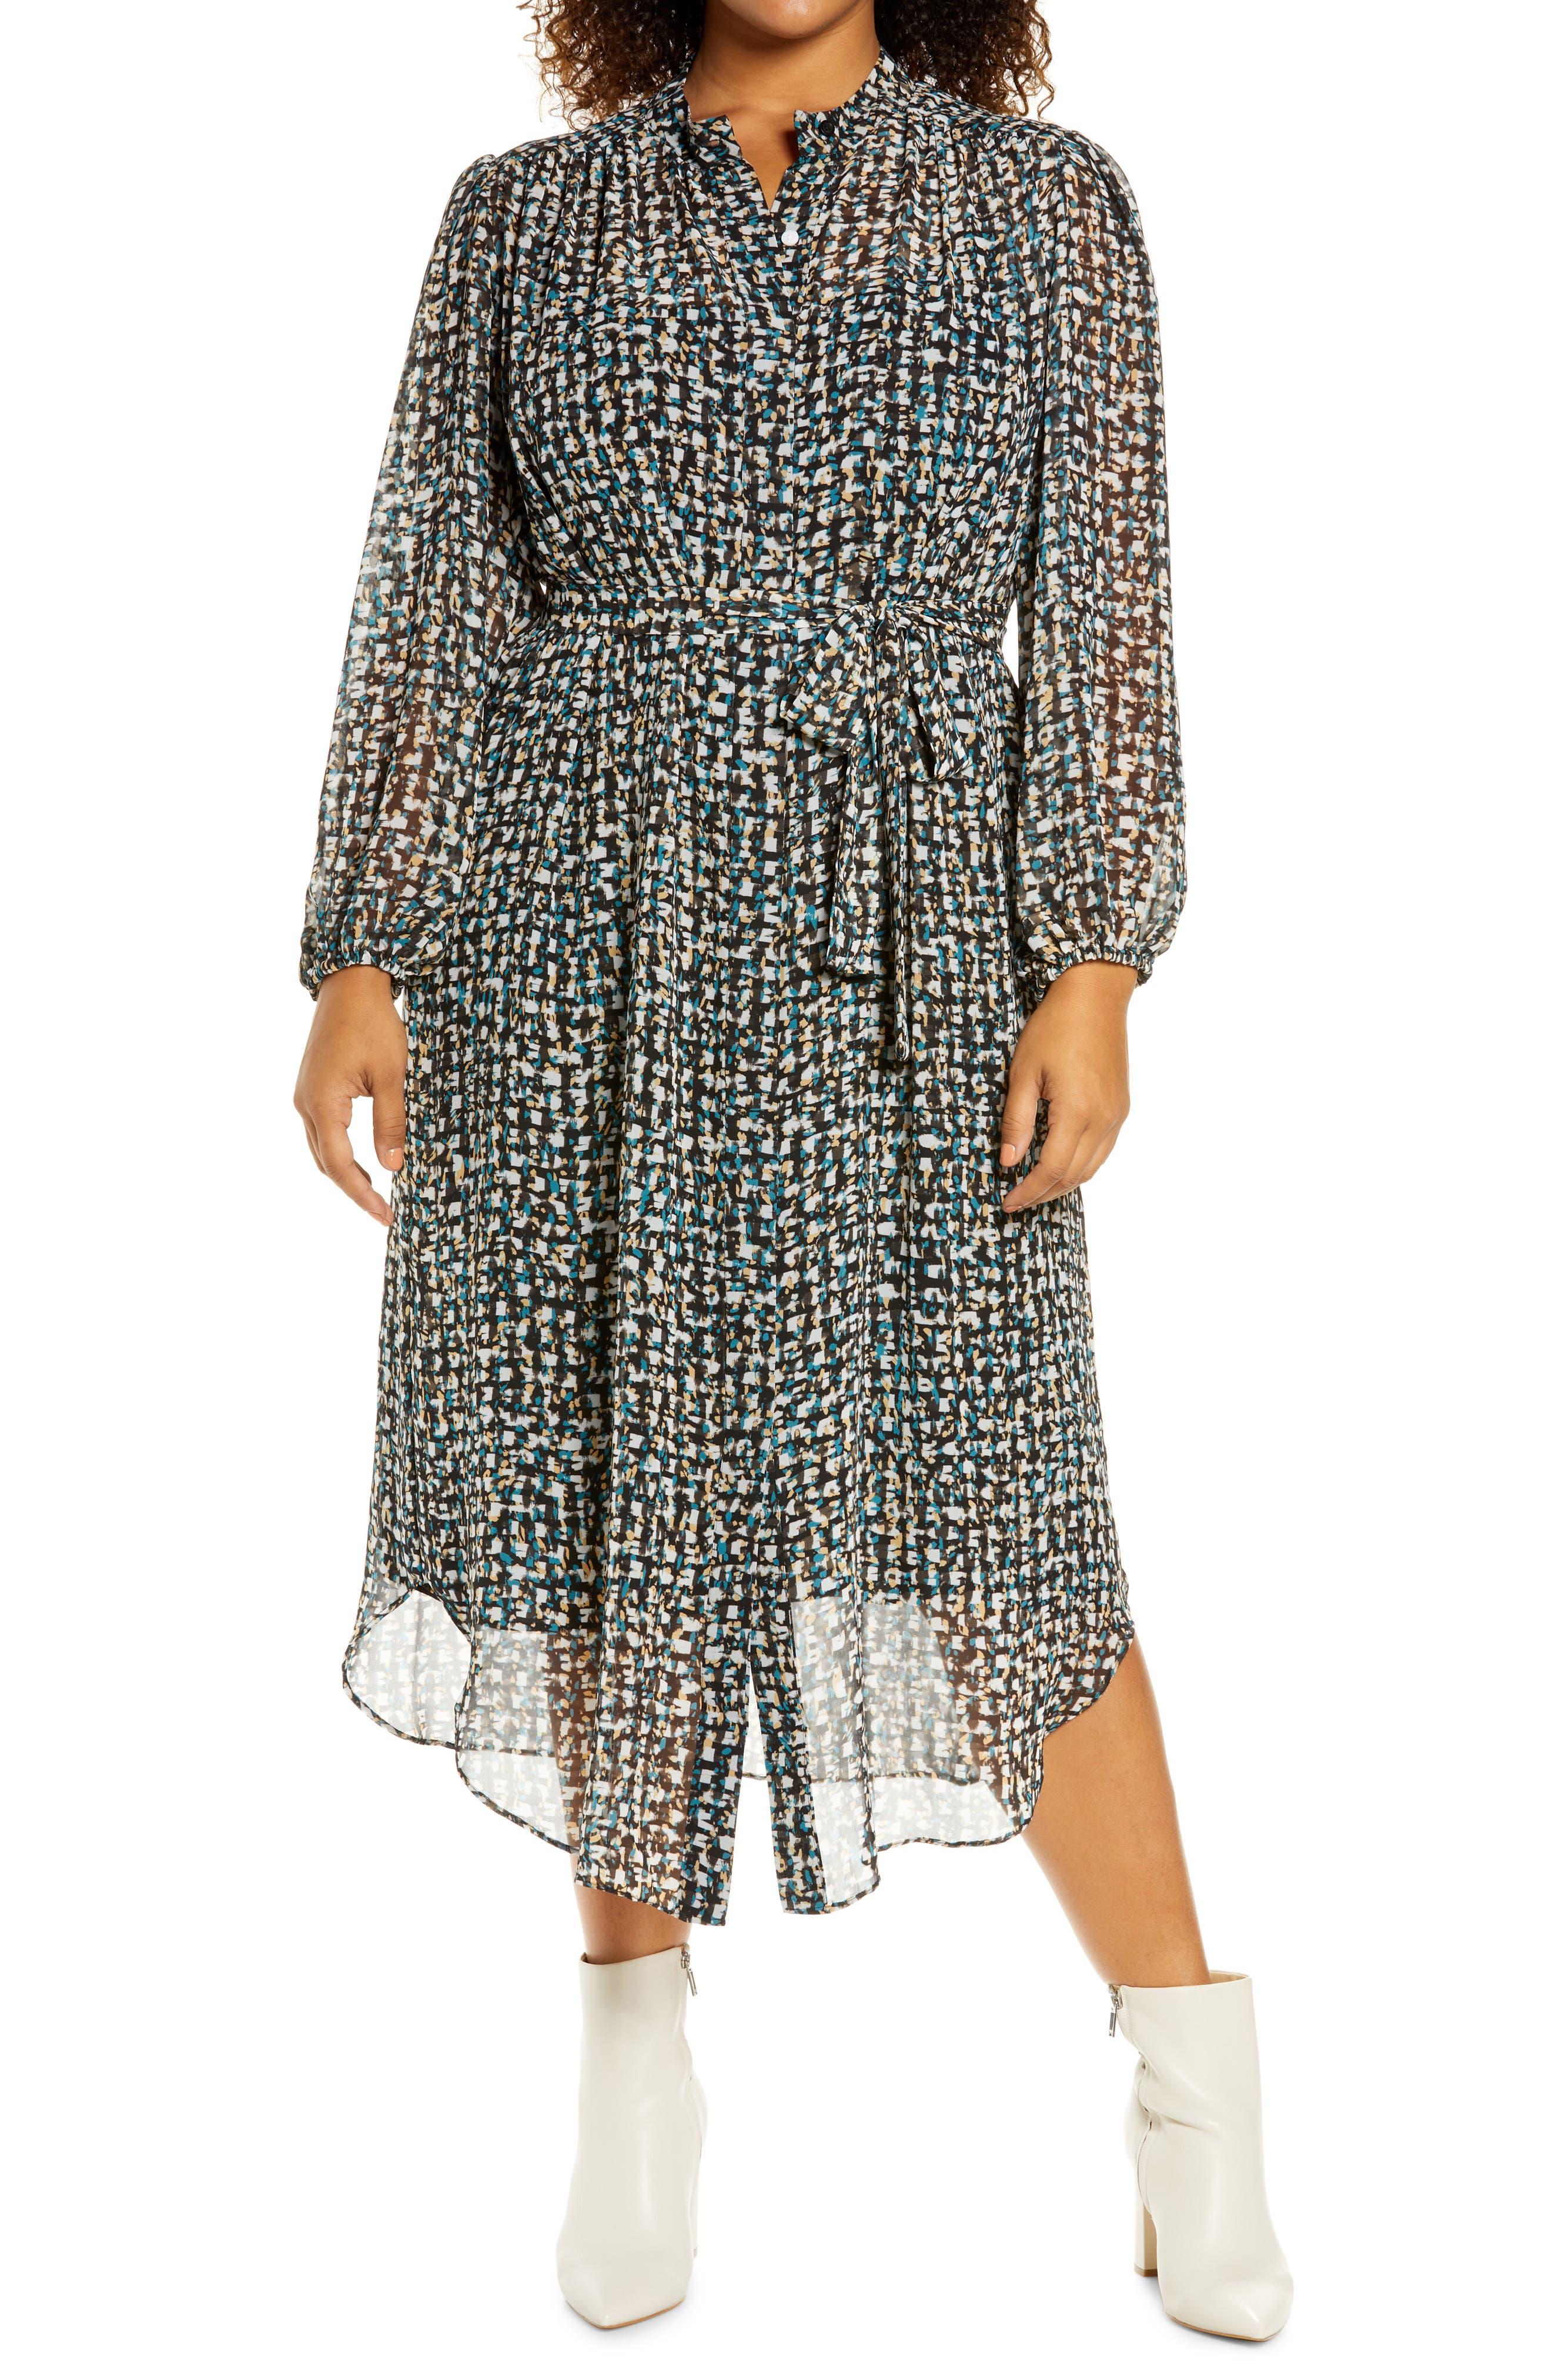 Abstract Print Long Sleeve Shirtdress